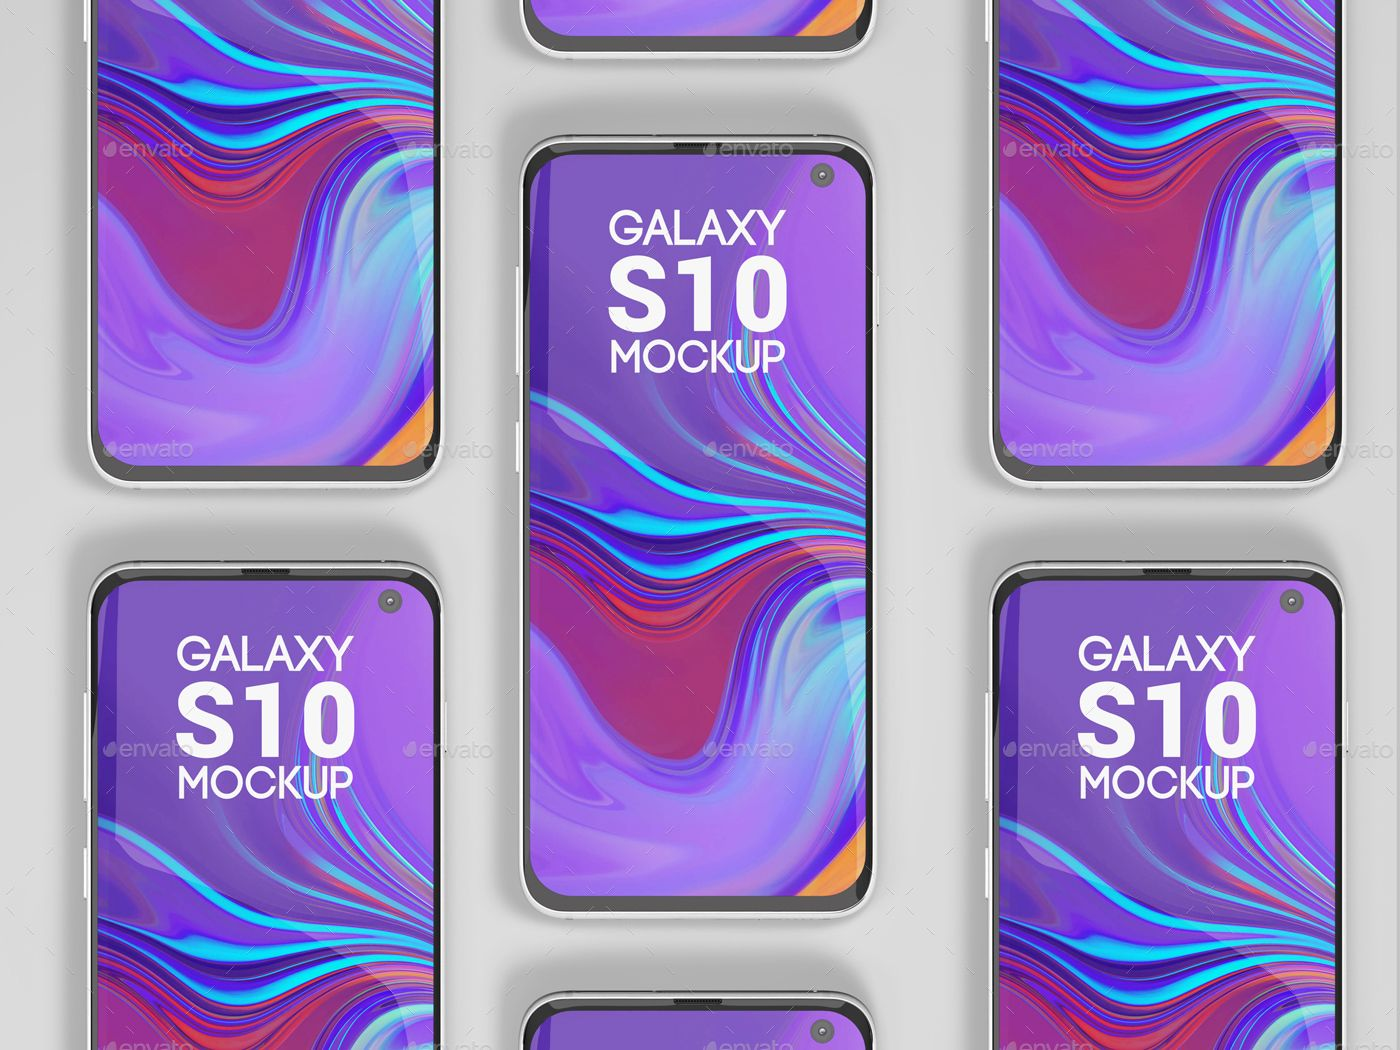 Phone S10 Screen Mockup